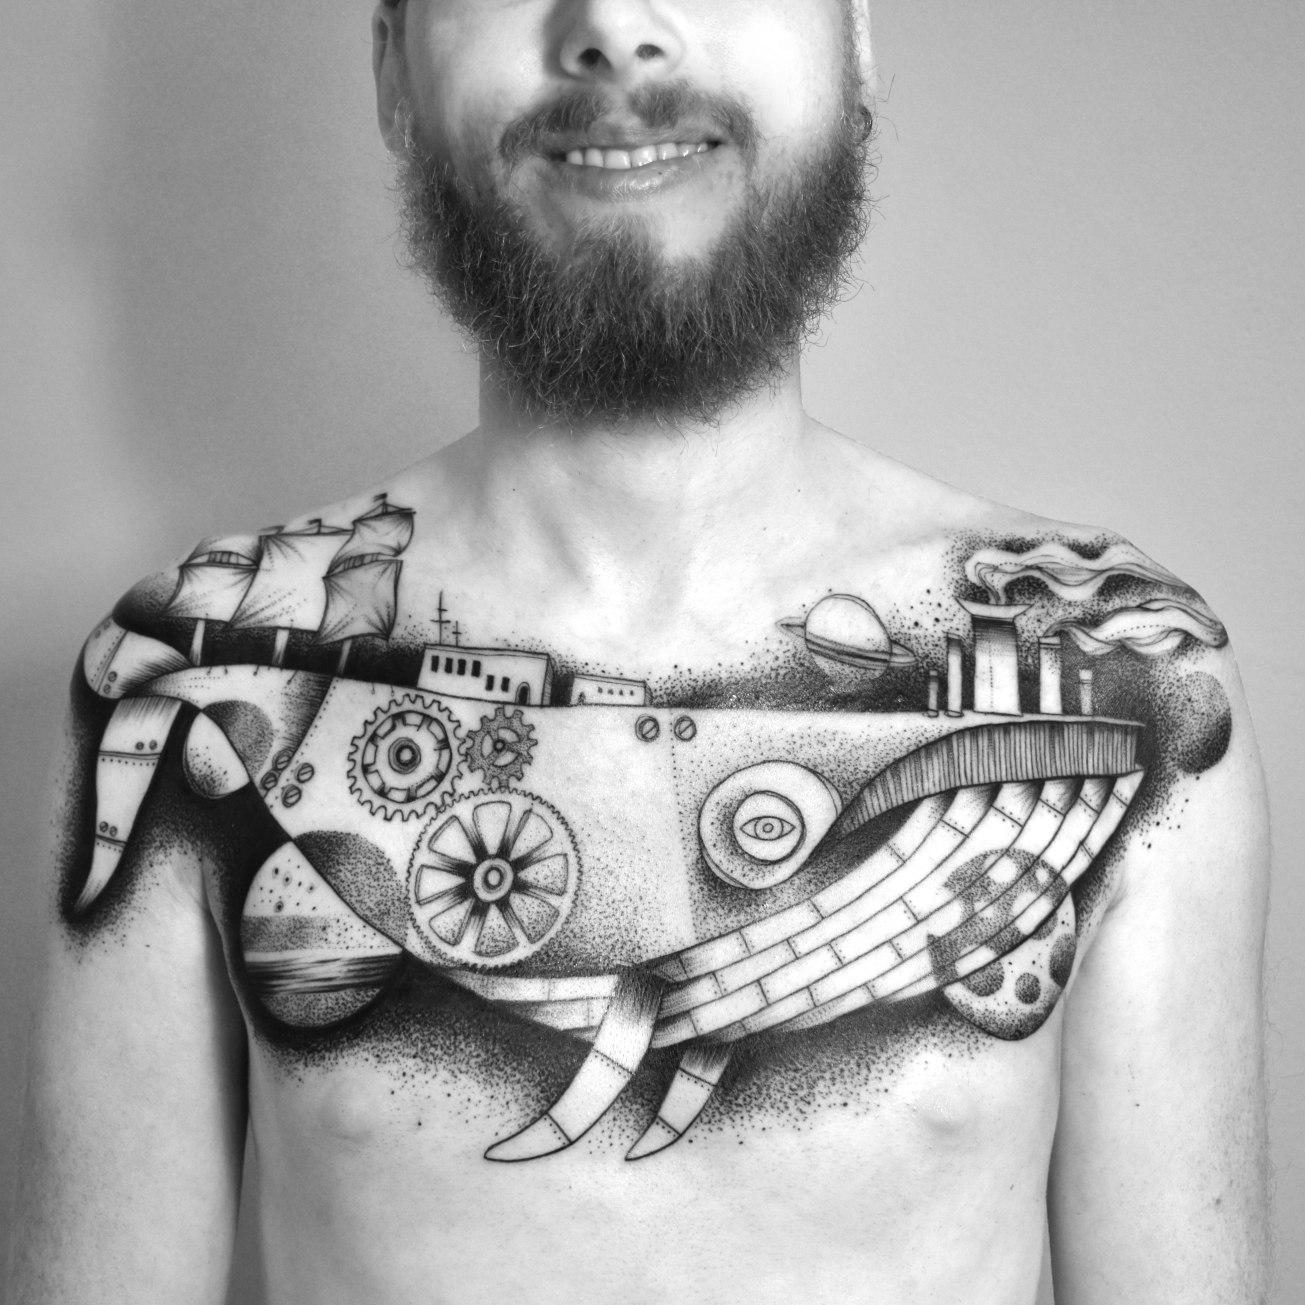 miriam_frank_tattoo_whale_space_3